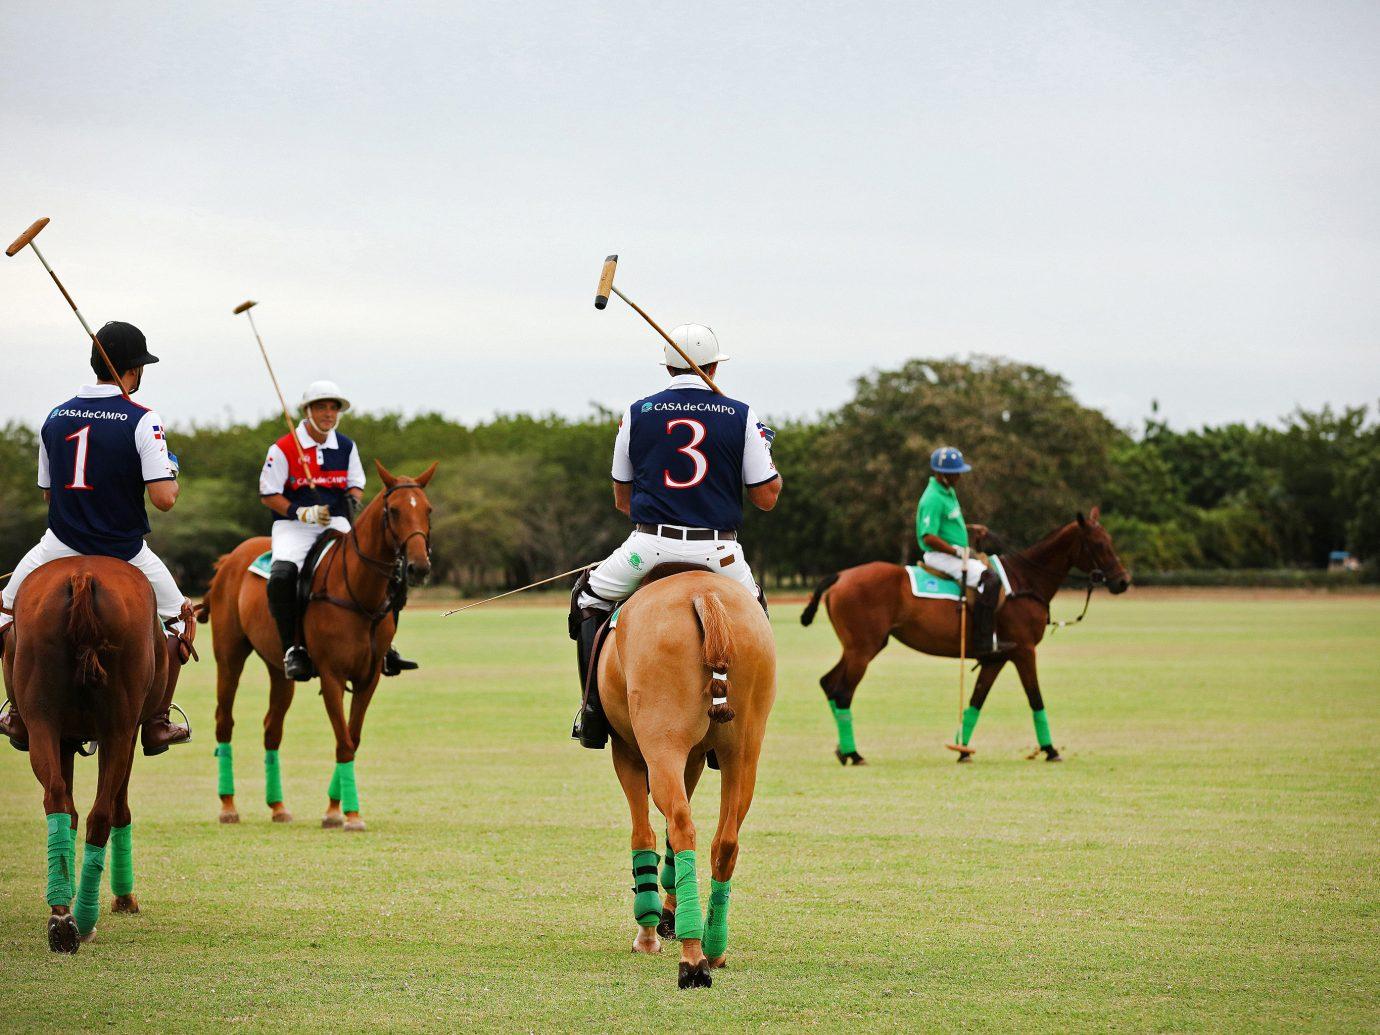 Polo Players In Dominican Republic